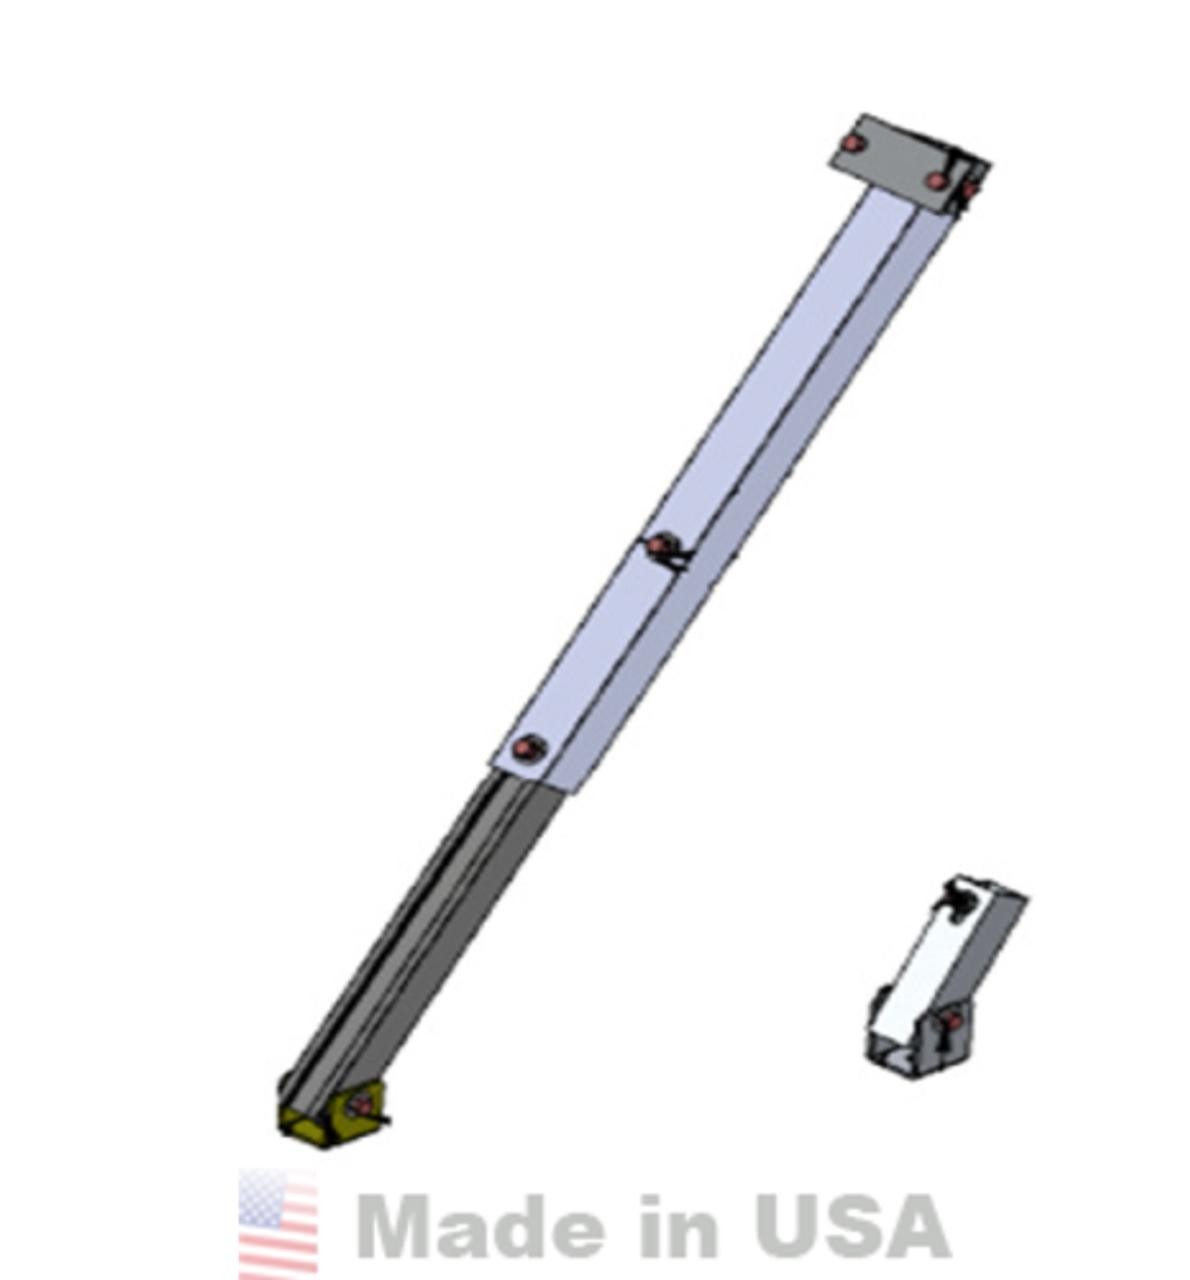 "IronRidge Adjustable Tilt Leg, 28"" (30-46"")"